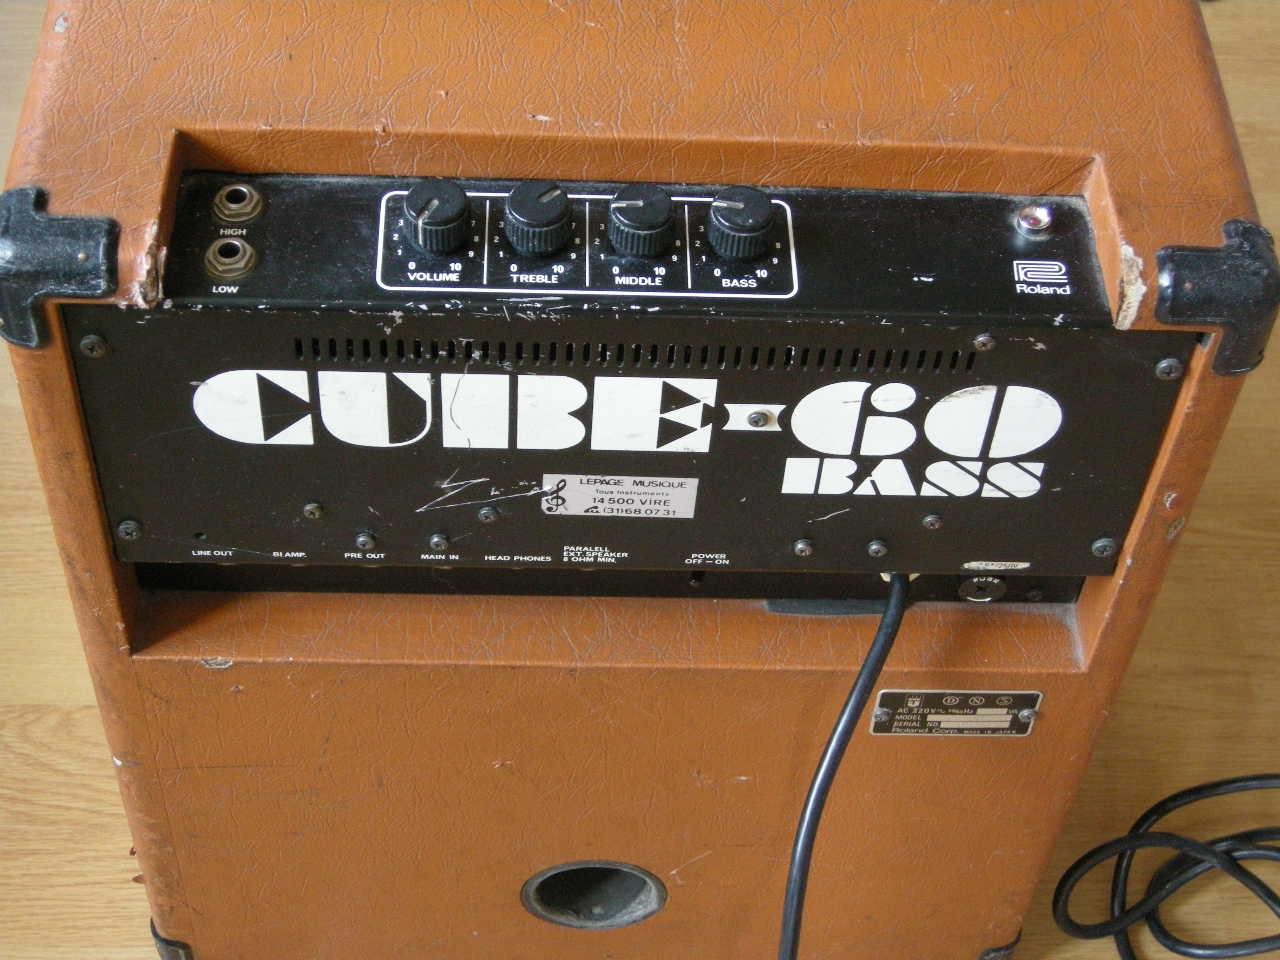 roland cube 60 bass image 667449 audiofanzine. Black Bedroom Furniture Sets. Home Design Ideas